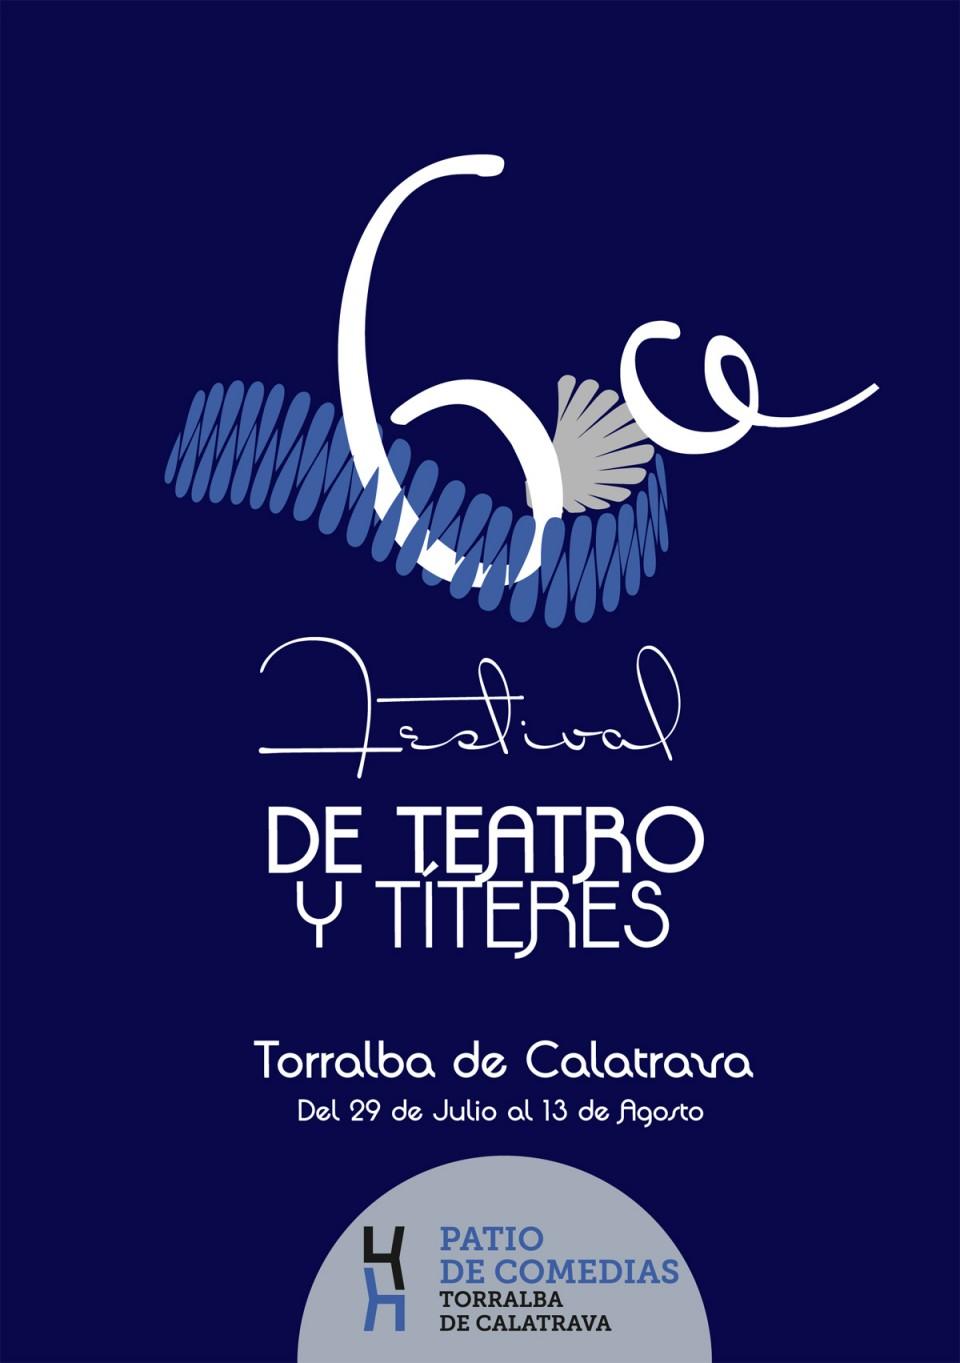 Llega el teatro a Torralba de Calatrava en el 6º Festival de Teatro y Títeres